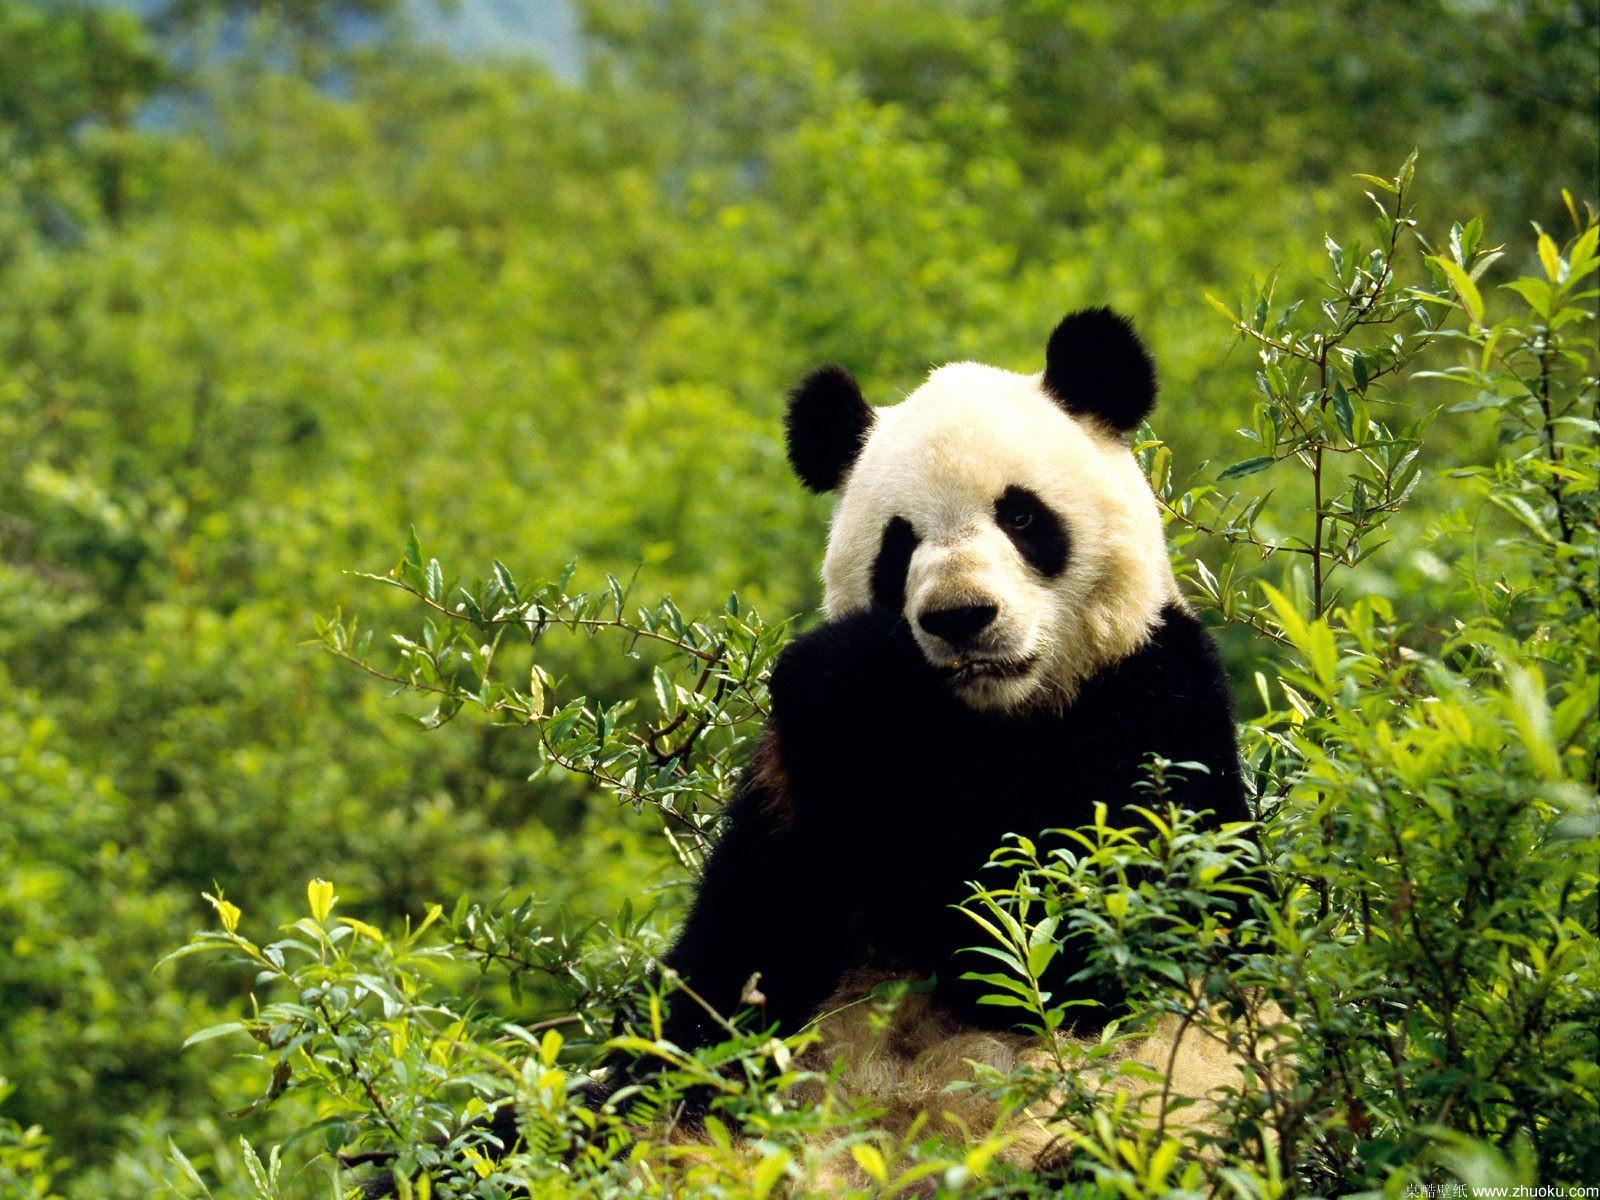 http://1.bp.blogspot.com/-KxgSBkRbilI/Tq0FEBMRefI/AAAAAAAABc8/rg3rkyzDJqI/s1600/panda-strong-bamboo-wallpaper.jpg